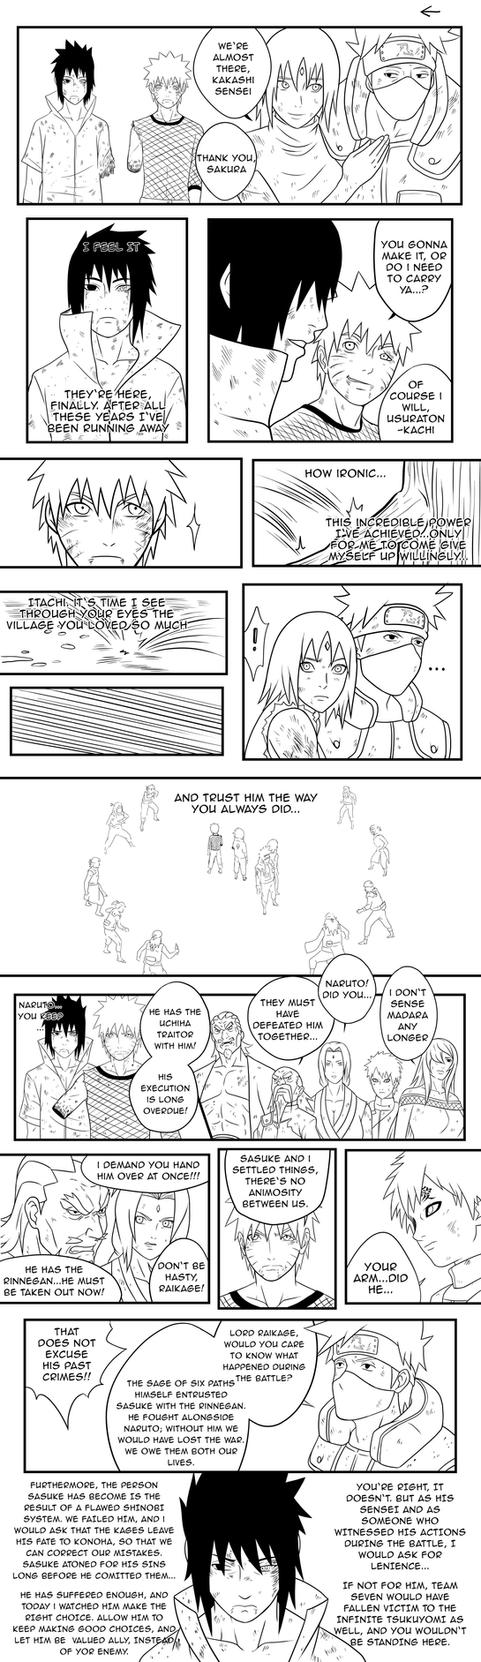 Sasuke's Fate (1/3) by Satosanteru